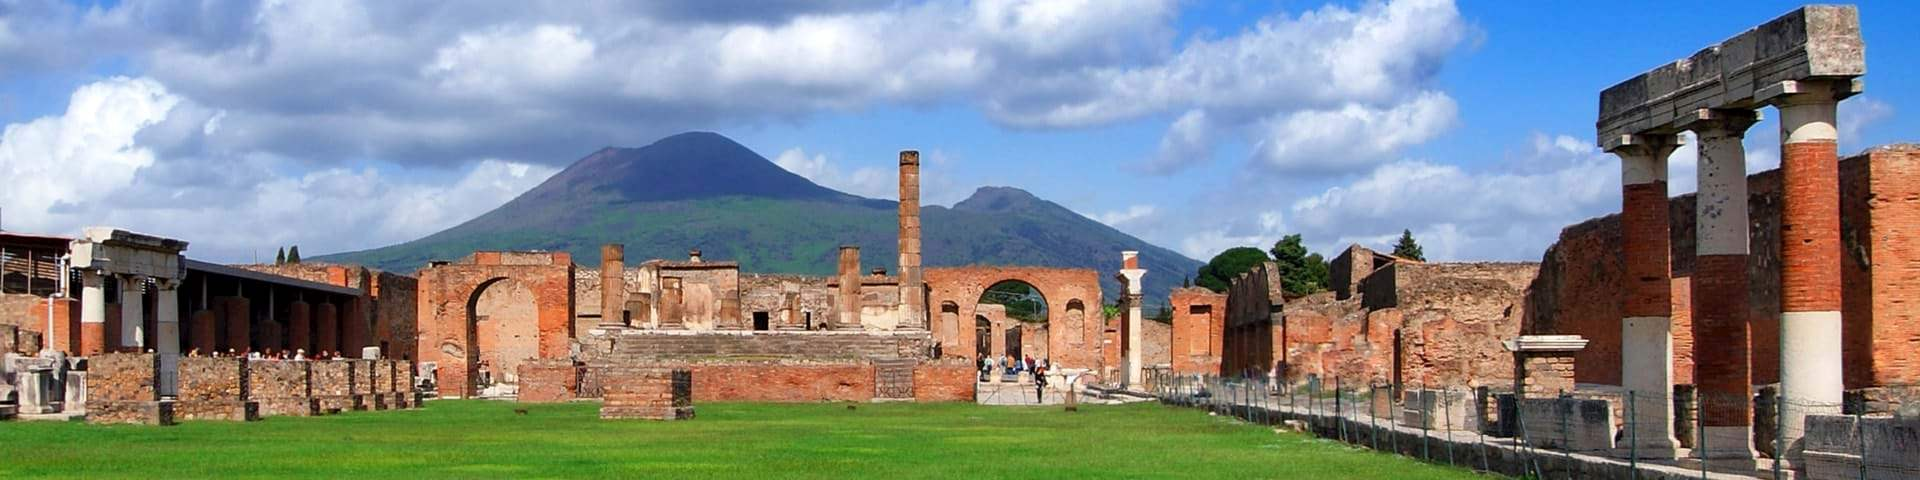 Pompeii Tours from Rome